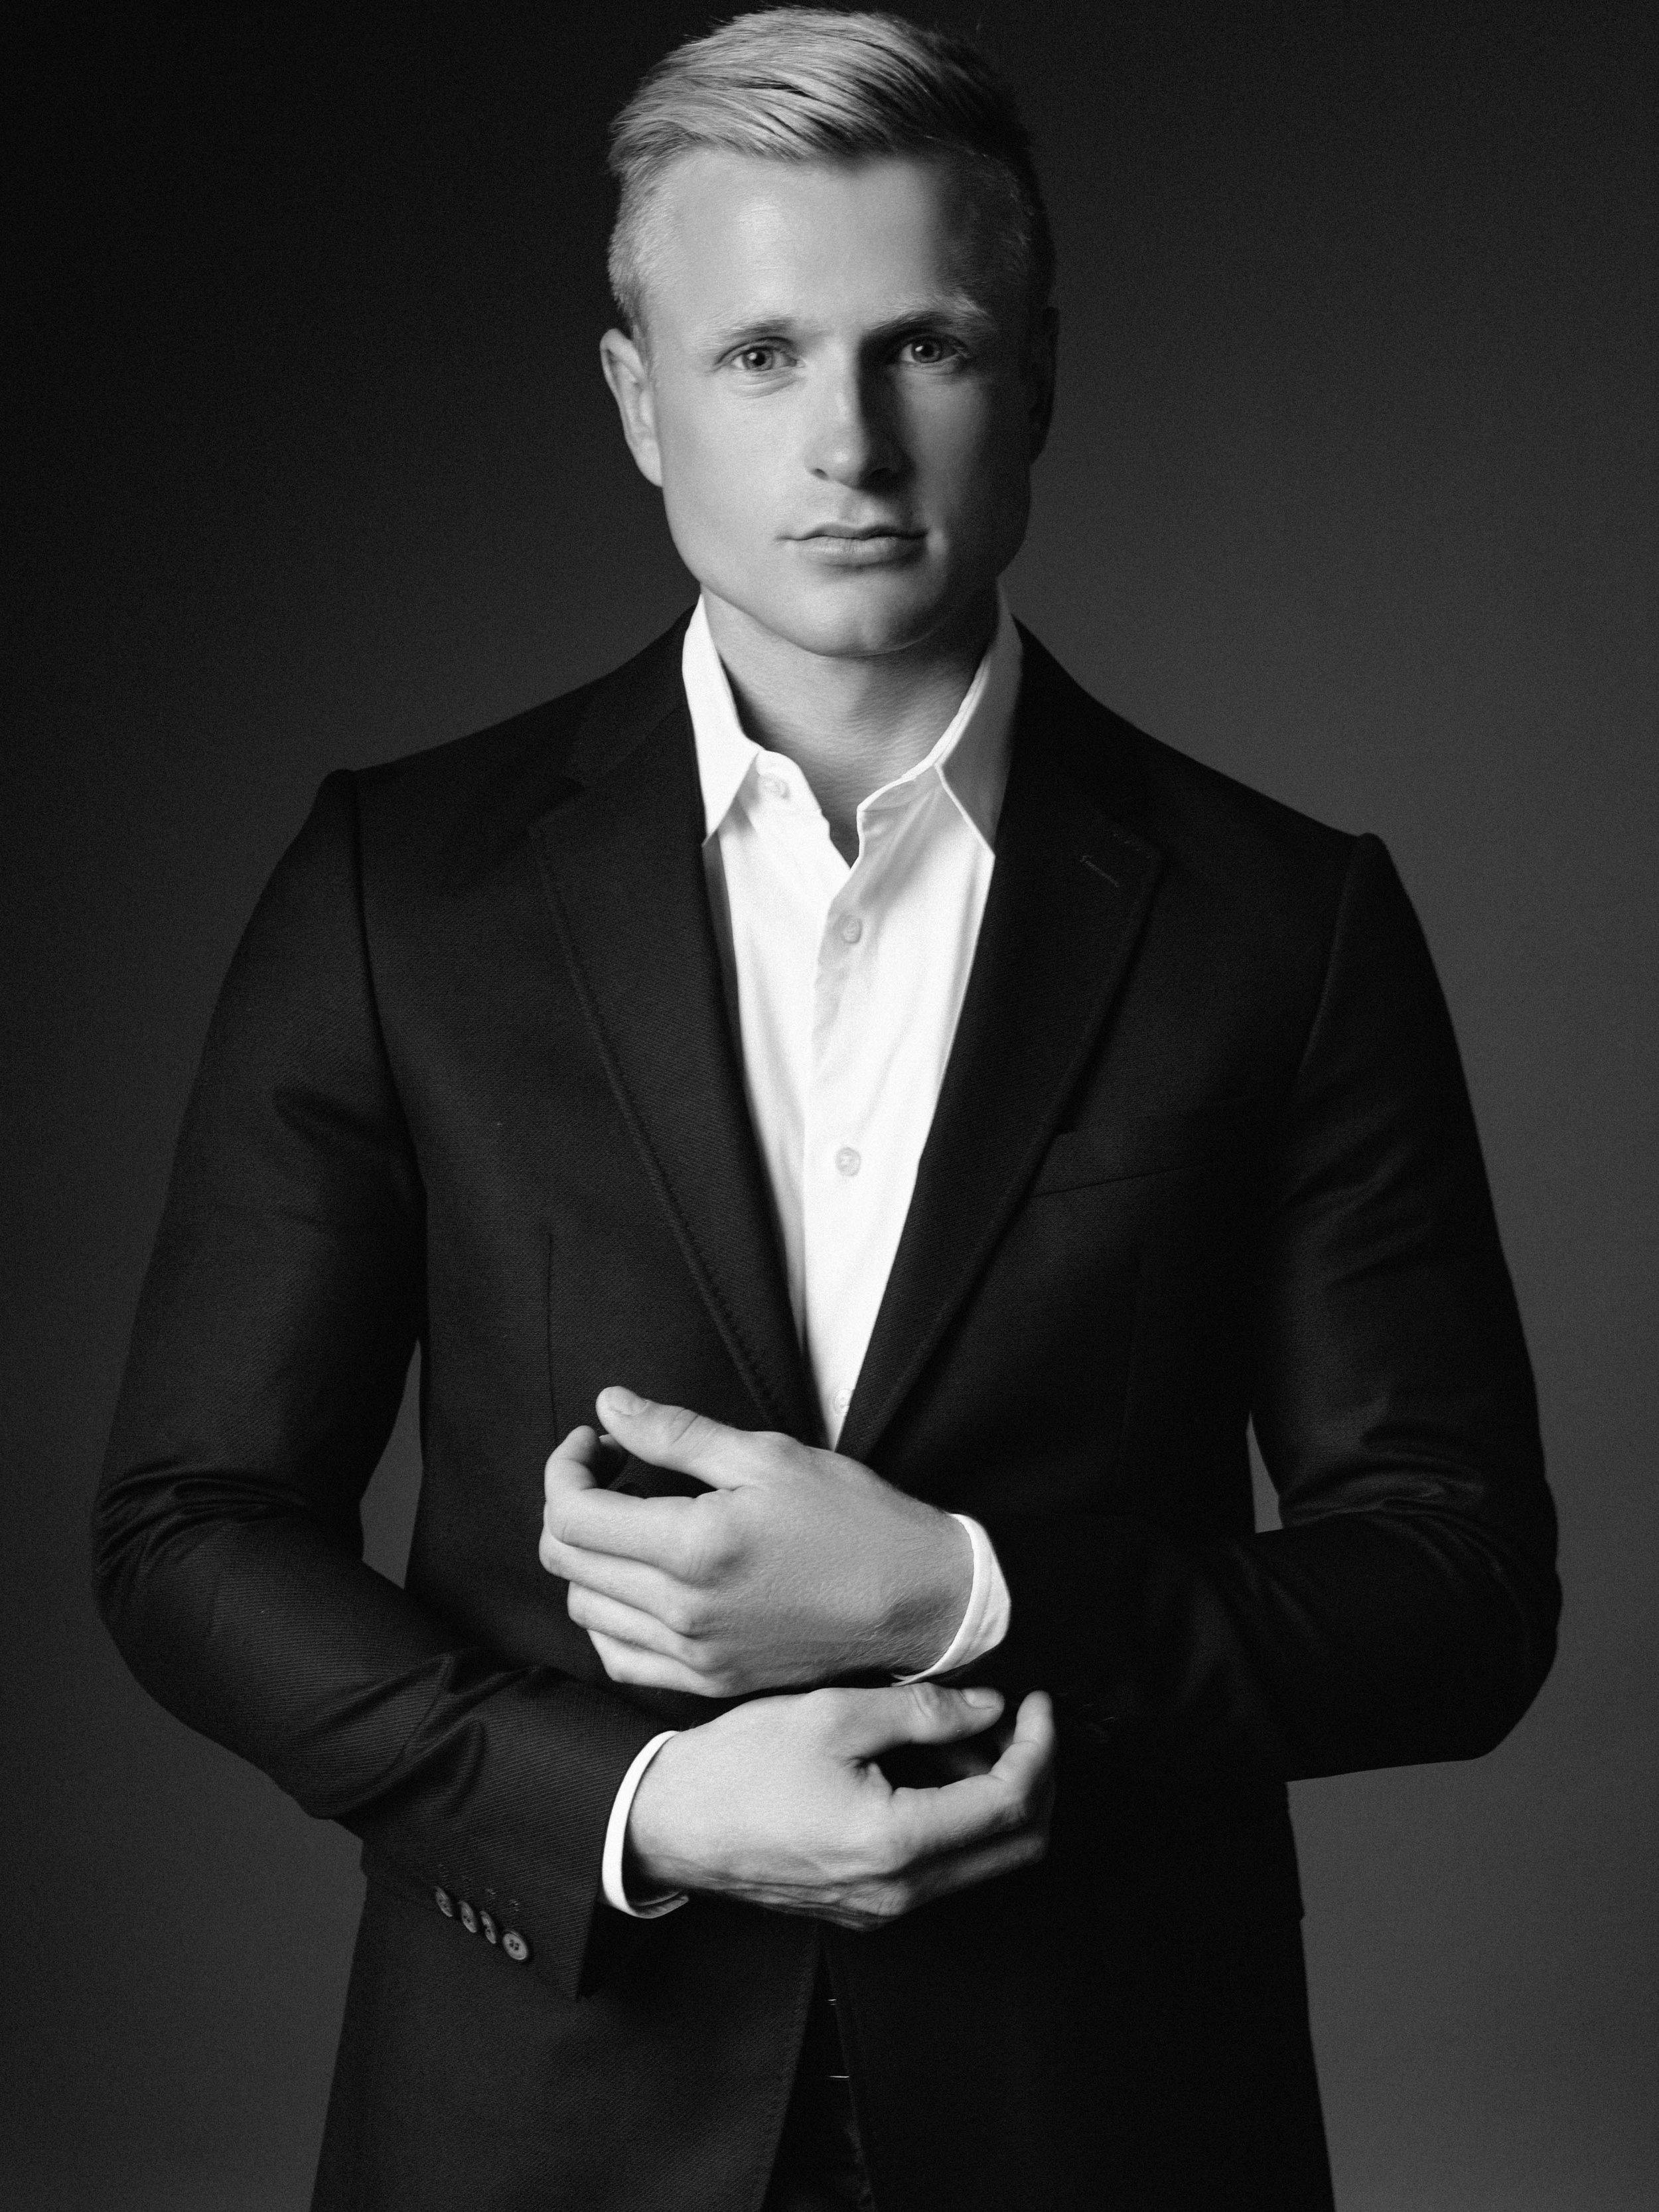 nyc-photographers-male-model-test-100093.jpg